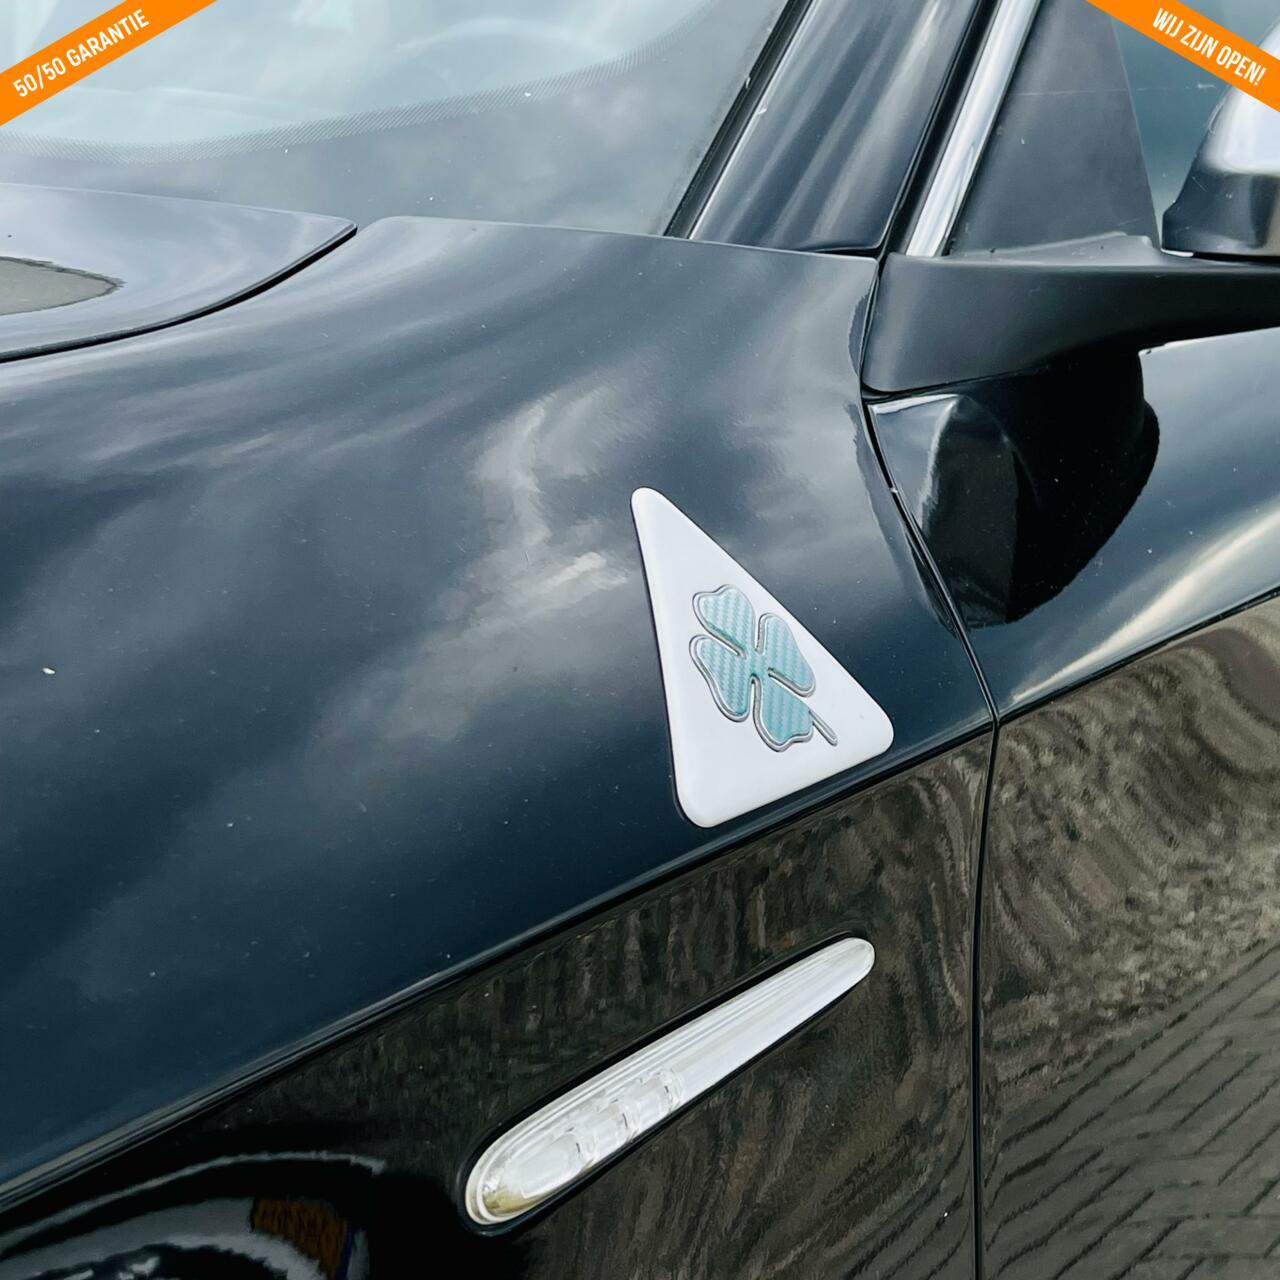 Caroutlet Groningen - Alfa Romeo Giulietta 1.7 TBi Quadrifoglio Verde 236PK | NAVI | CRUISE | LEDER | QV